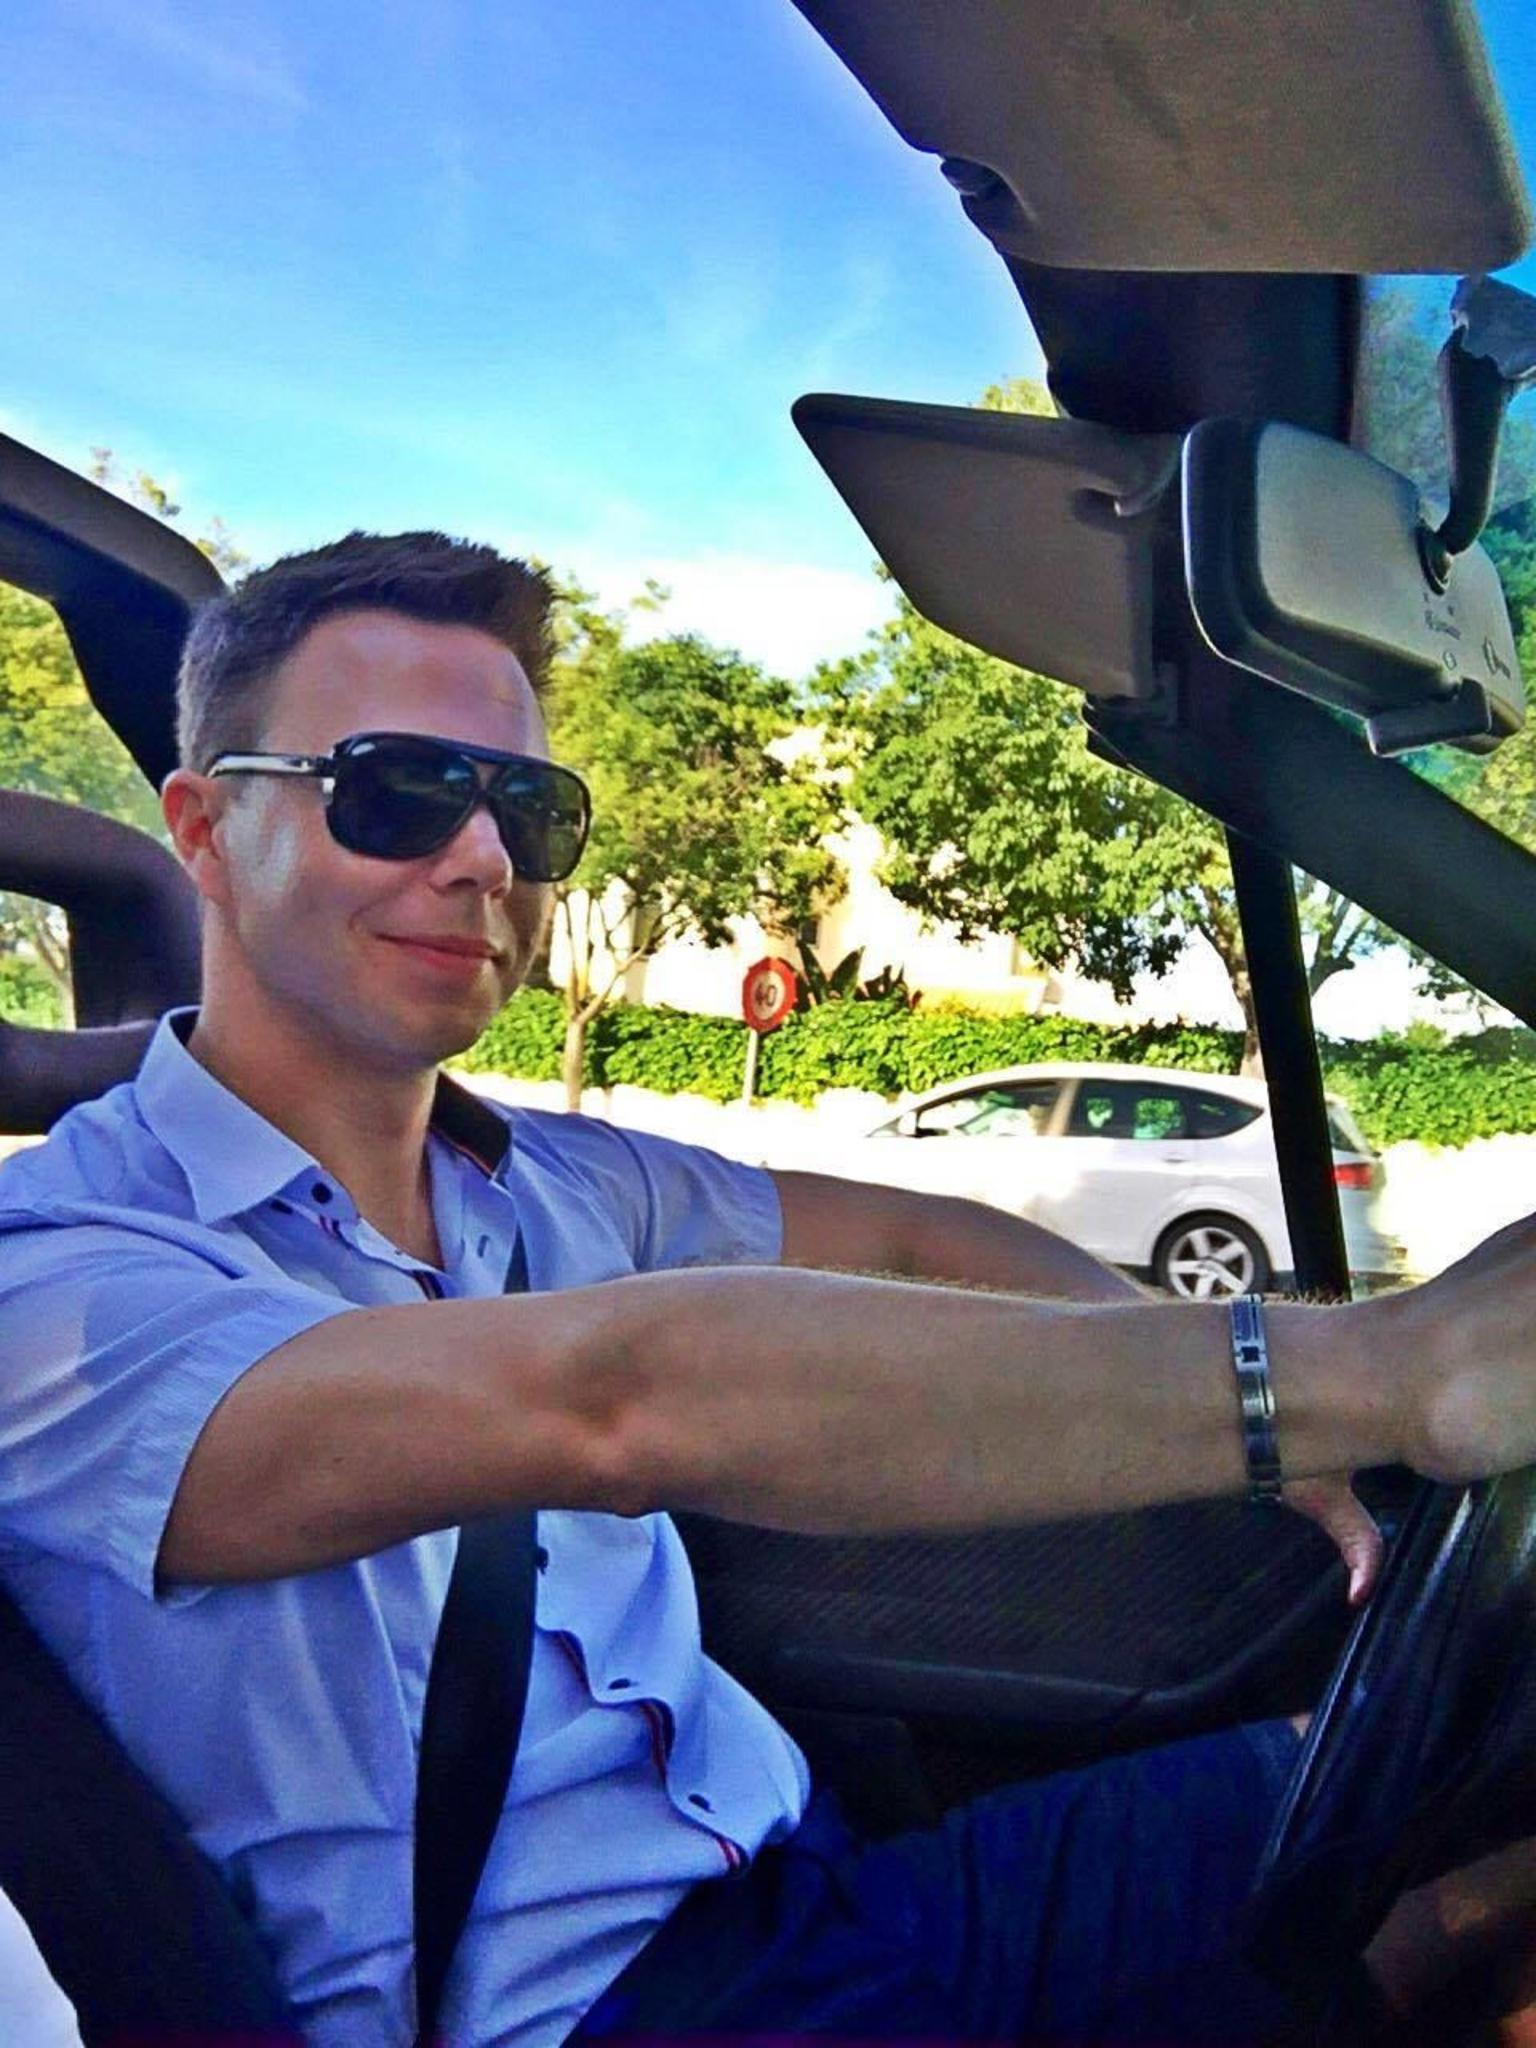 MORE PHOTOS, Full-Day Algarve Tour by Convertible Cabrio from Portimão